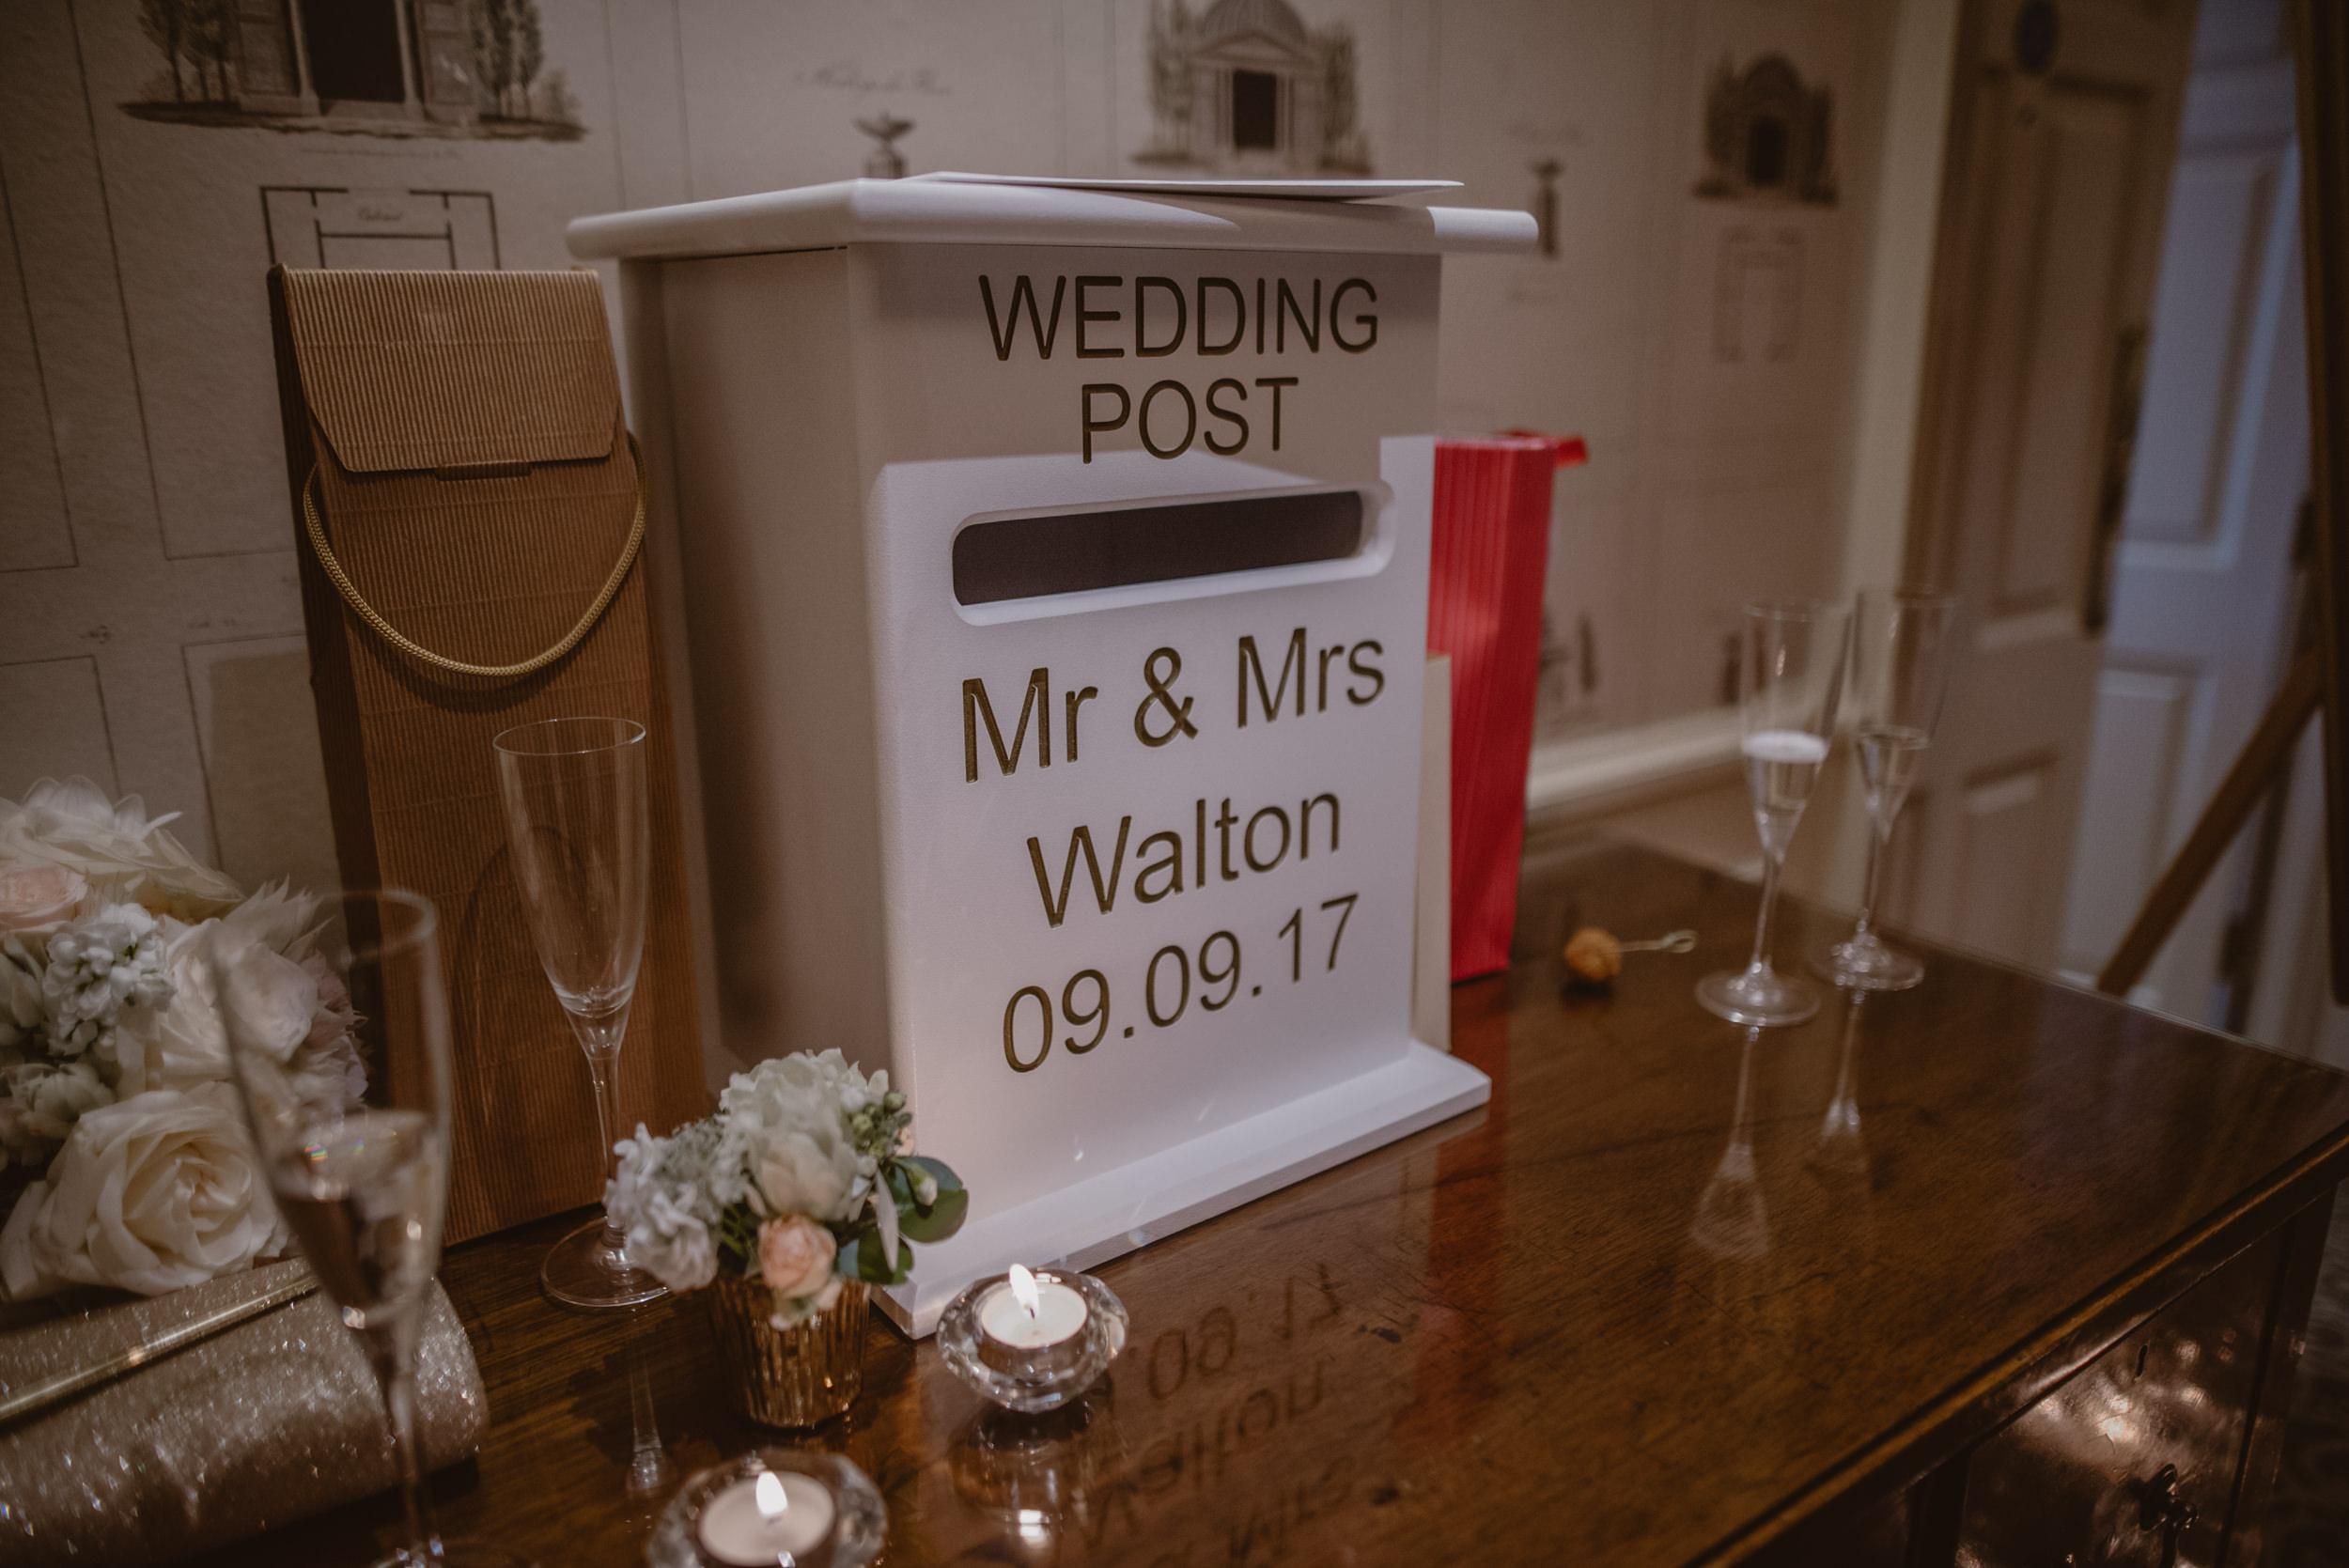 Trisha-and-Roger-wedding-The-Priory-Church-and-Chewton-Glen-Hotel-Christchurch-Manu-Mendoza-Wedding-Photography-284.jpg